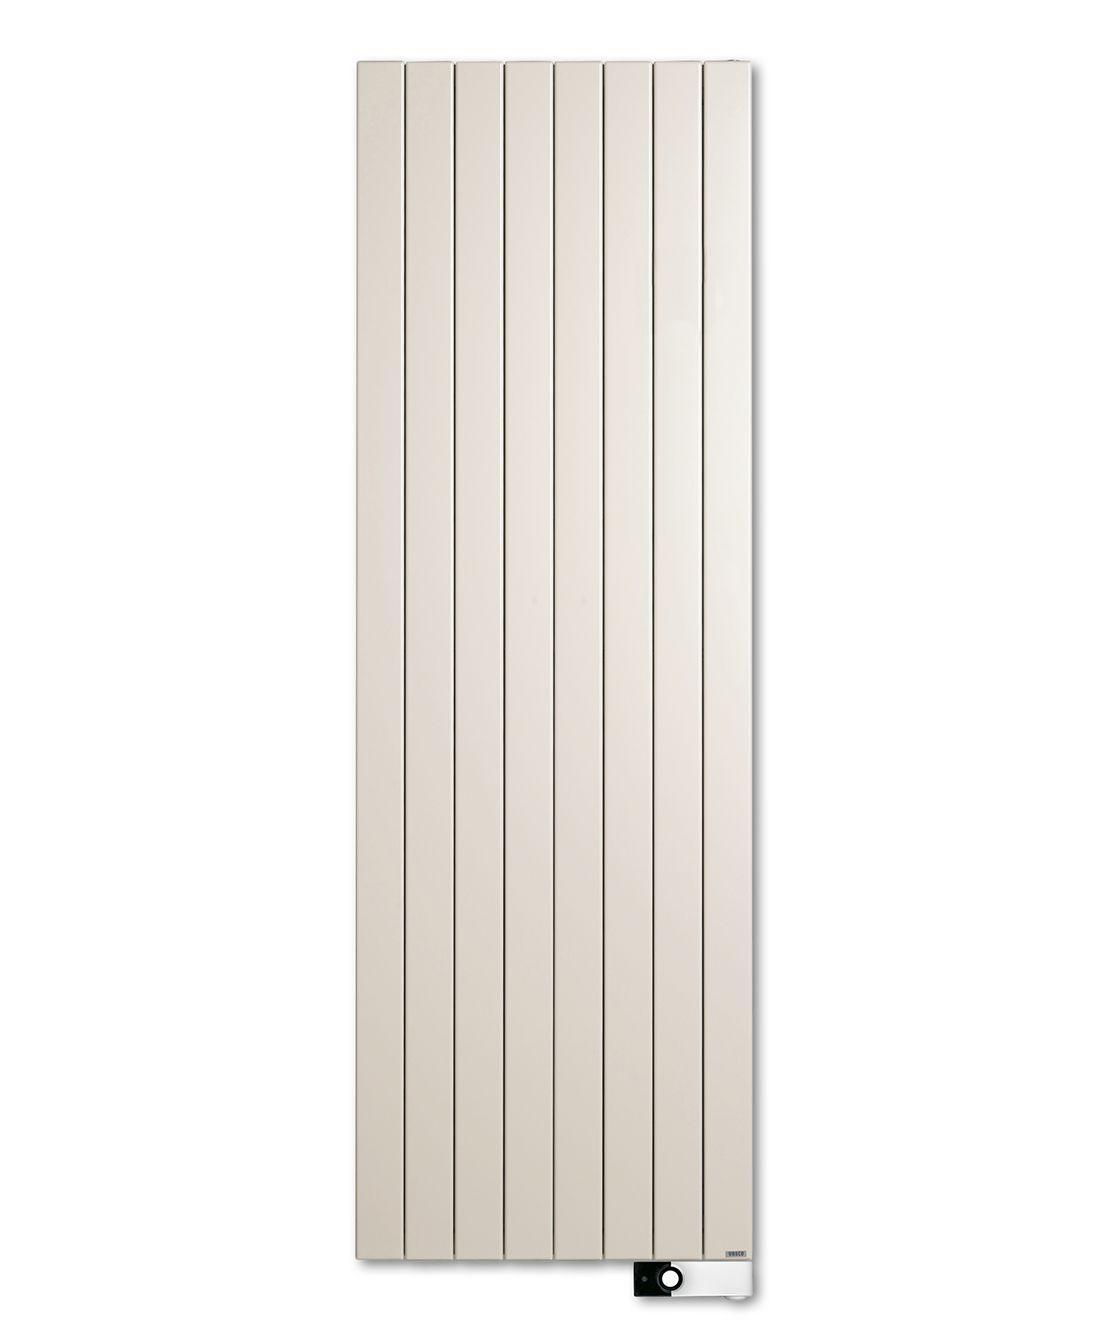 Calorifere electrice de perete Vasco Viola V1L1-ZB-EL 1800x505mm, 1250W